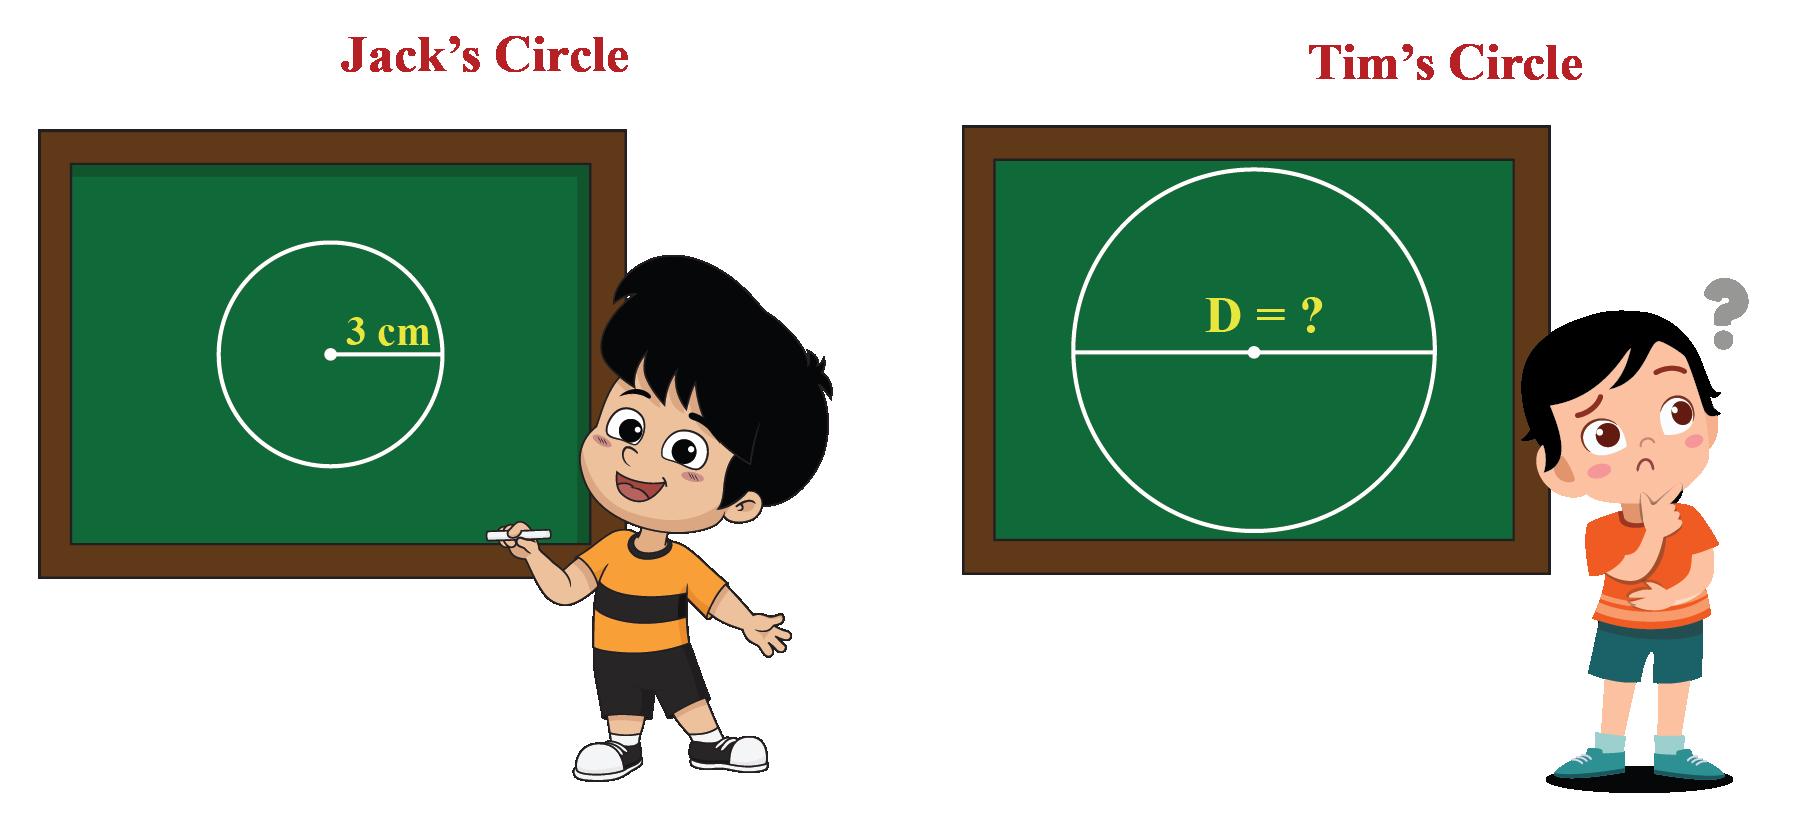 Jack and Tim's circle